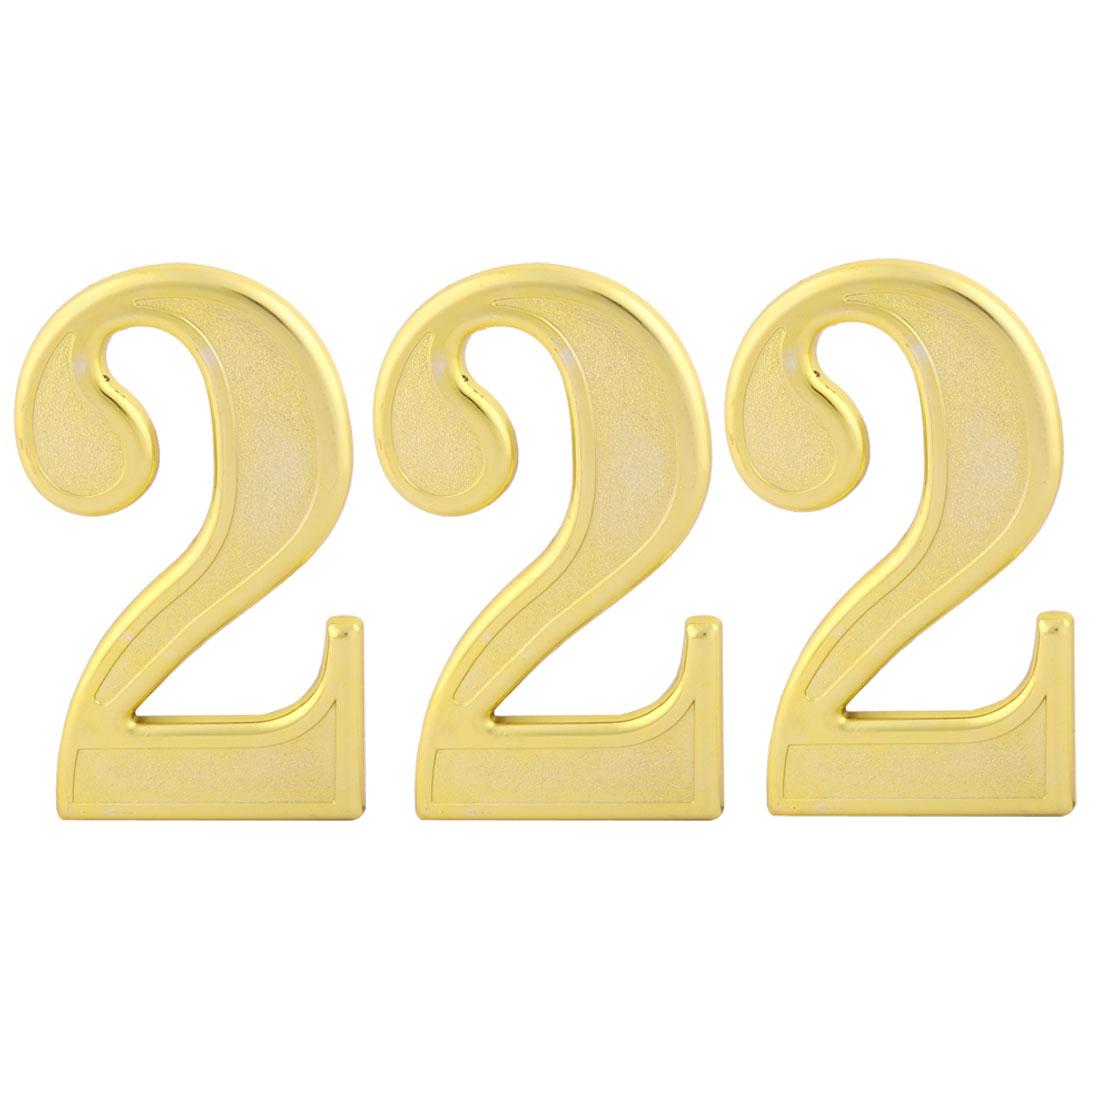 Address Street Plastic 2 Shaped Plate Number Self Adhesive Stick Sign Label 3pcs